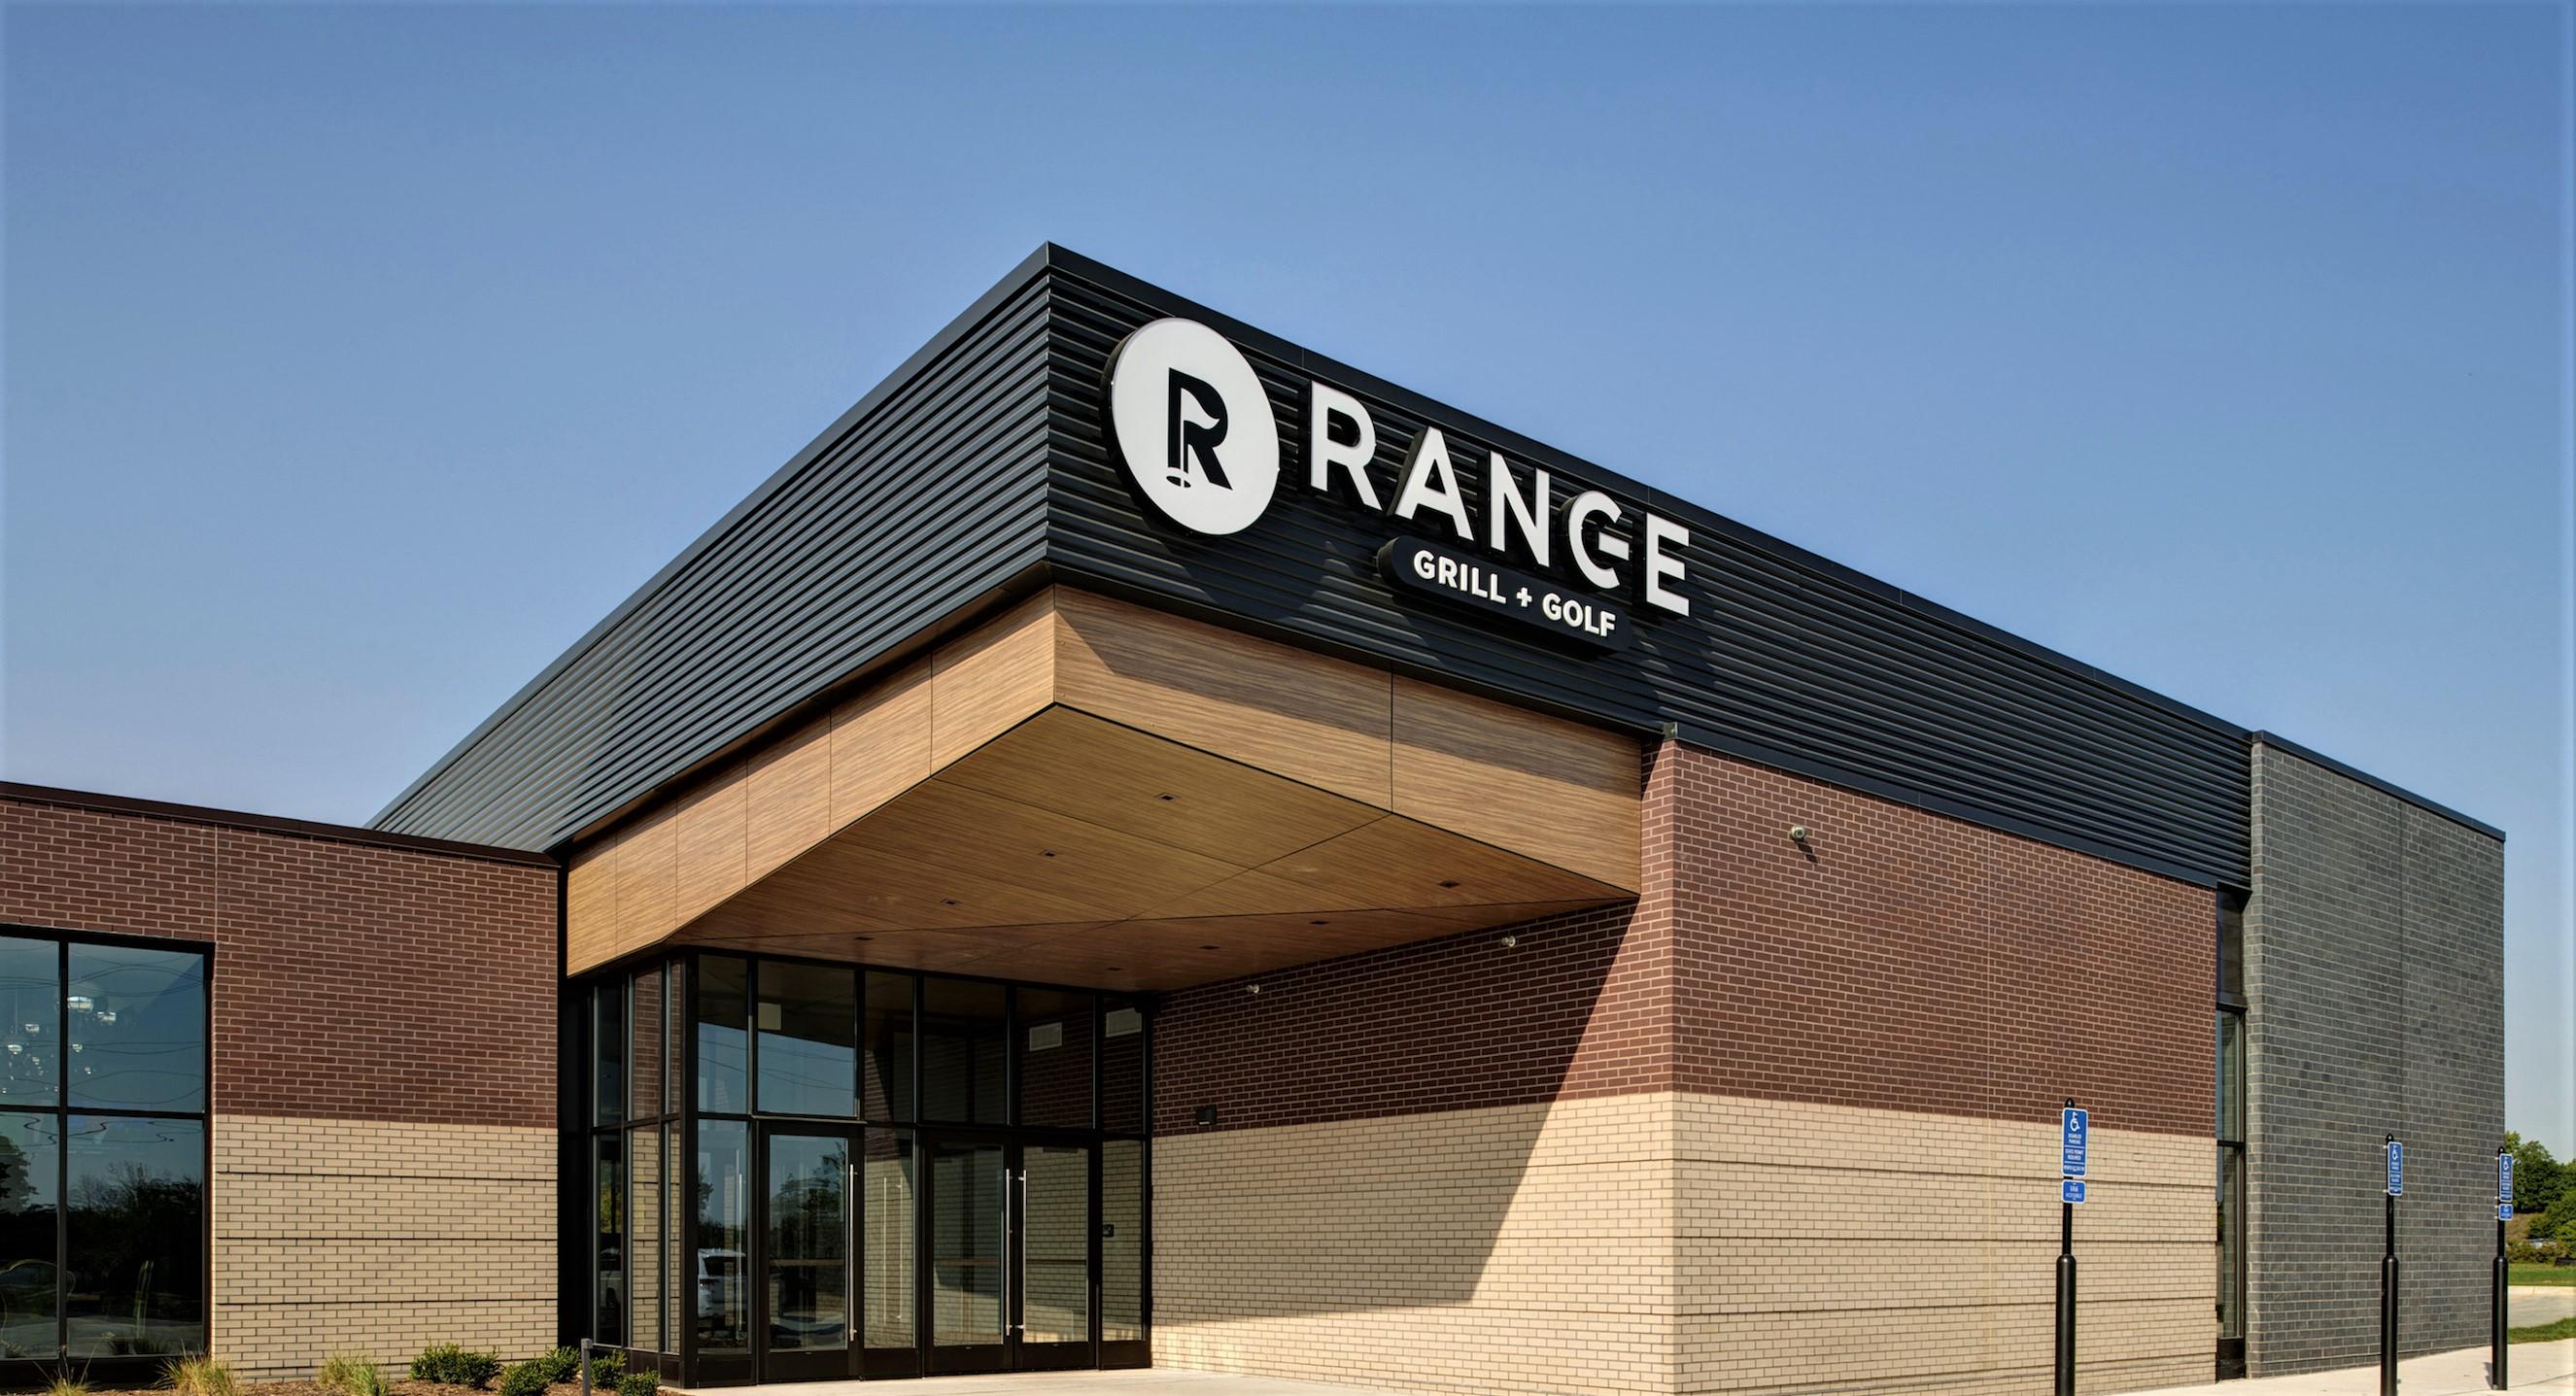 The Range Grill & Golf, Urbandale, Iowa